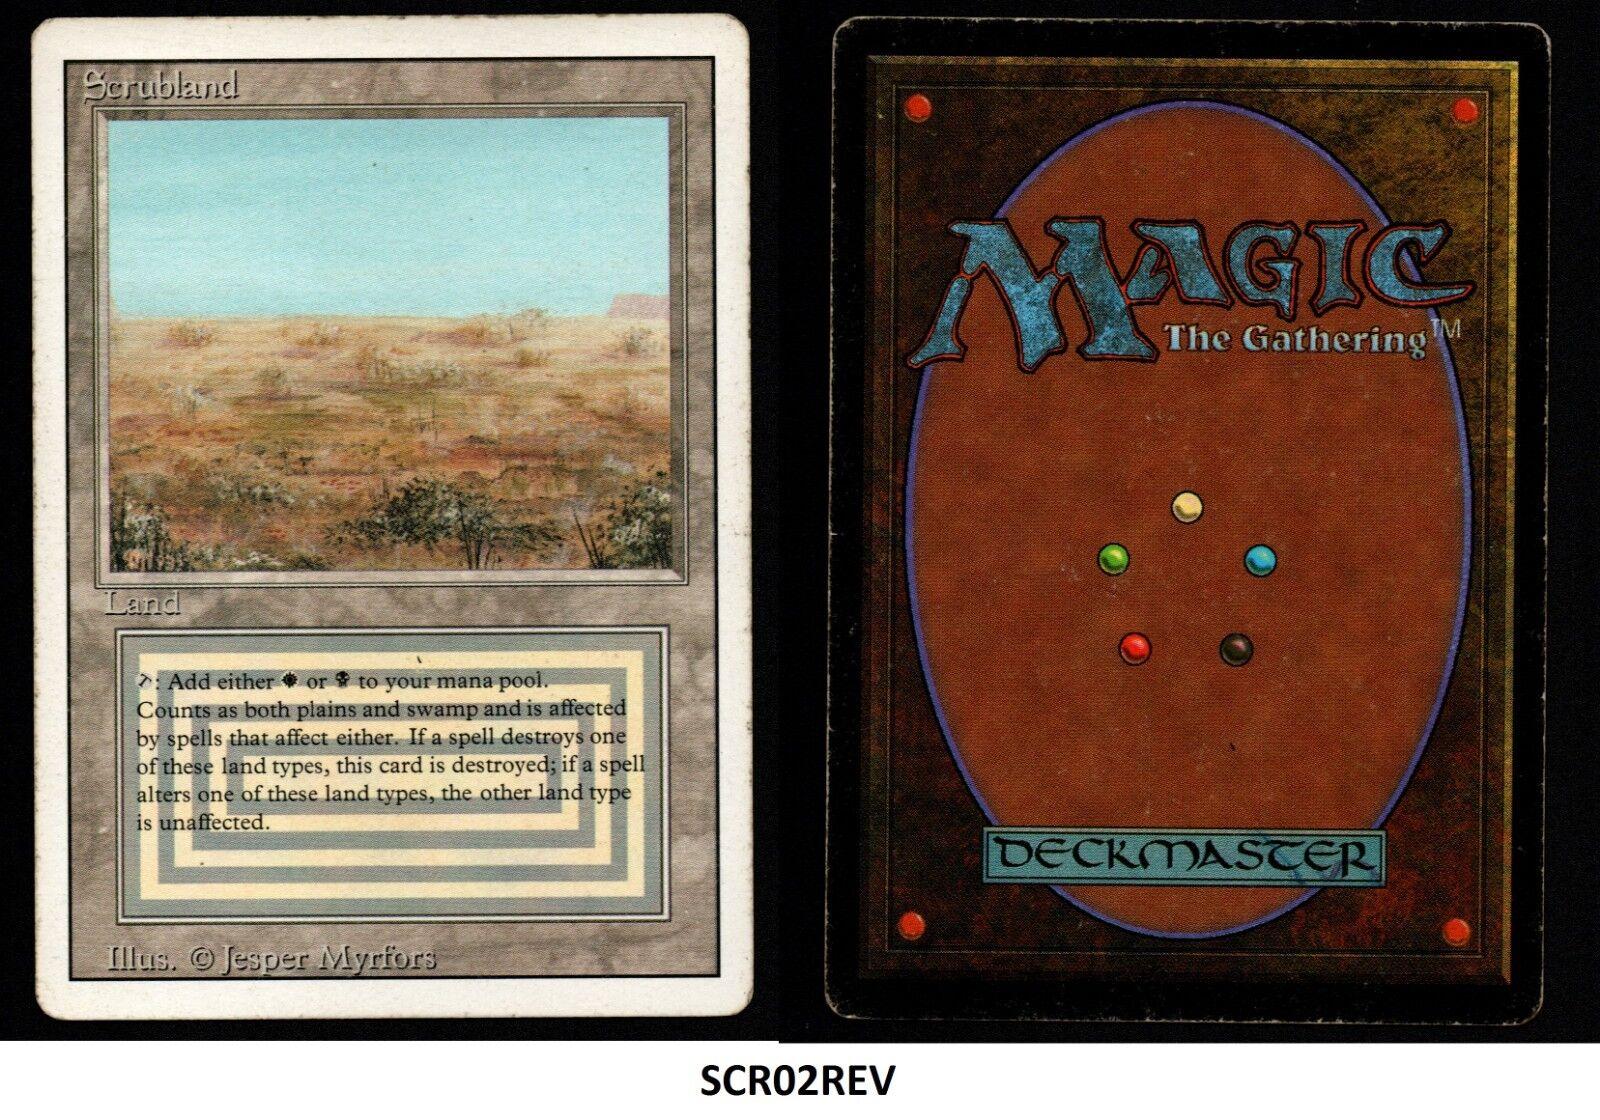 Mrm english scrubland-bush good played mtg magic revised (scr02rev)